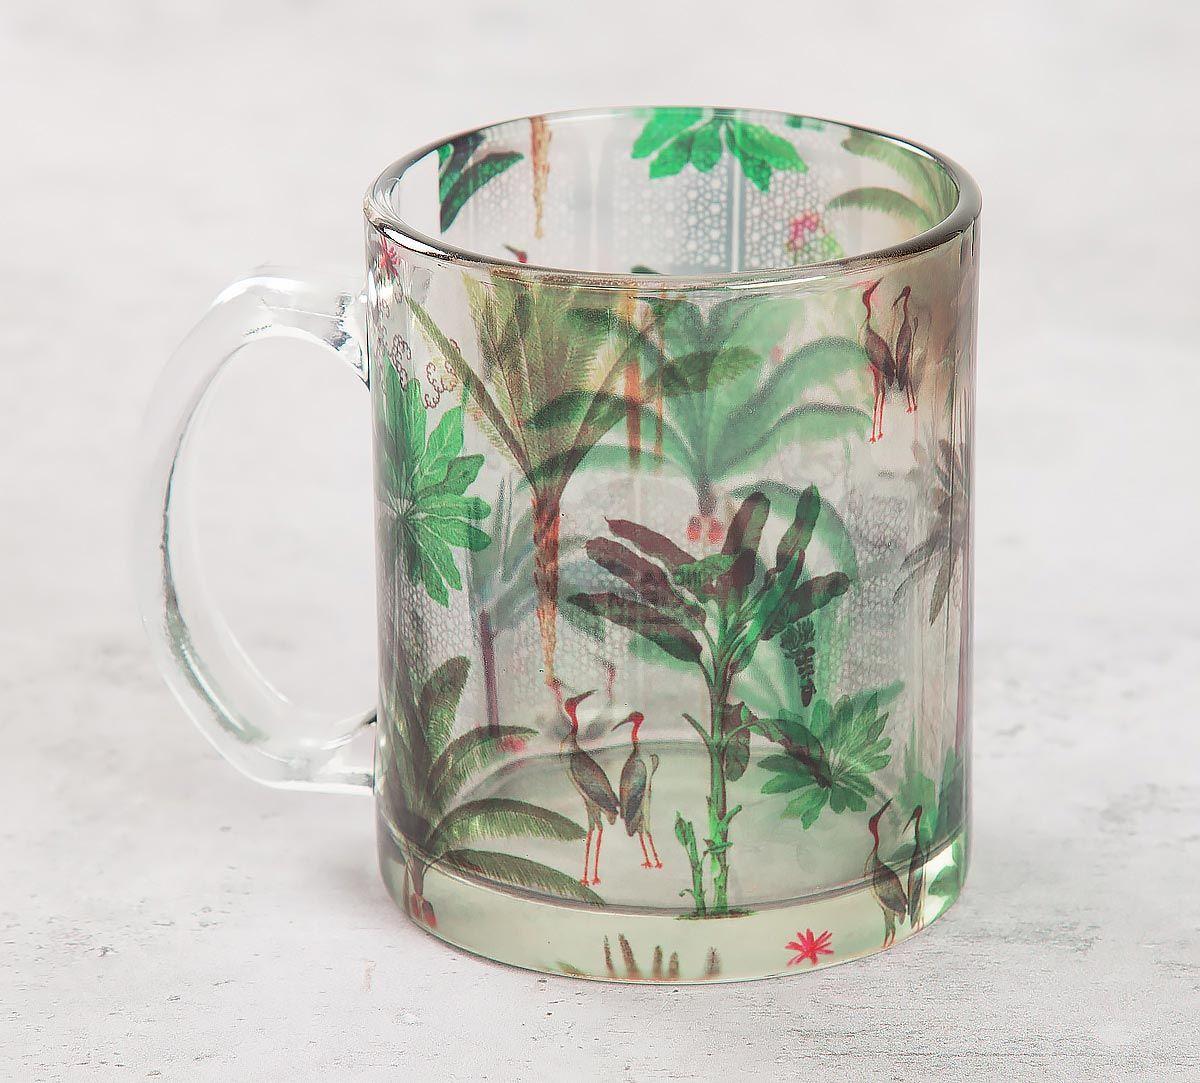 India Circus Heron's Garden Glass Mug